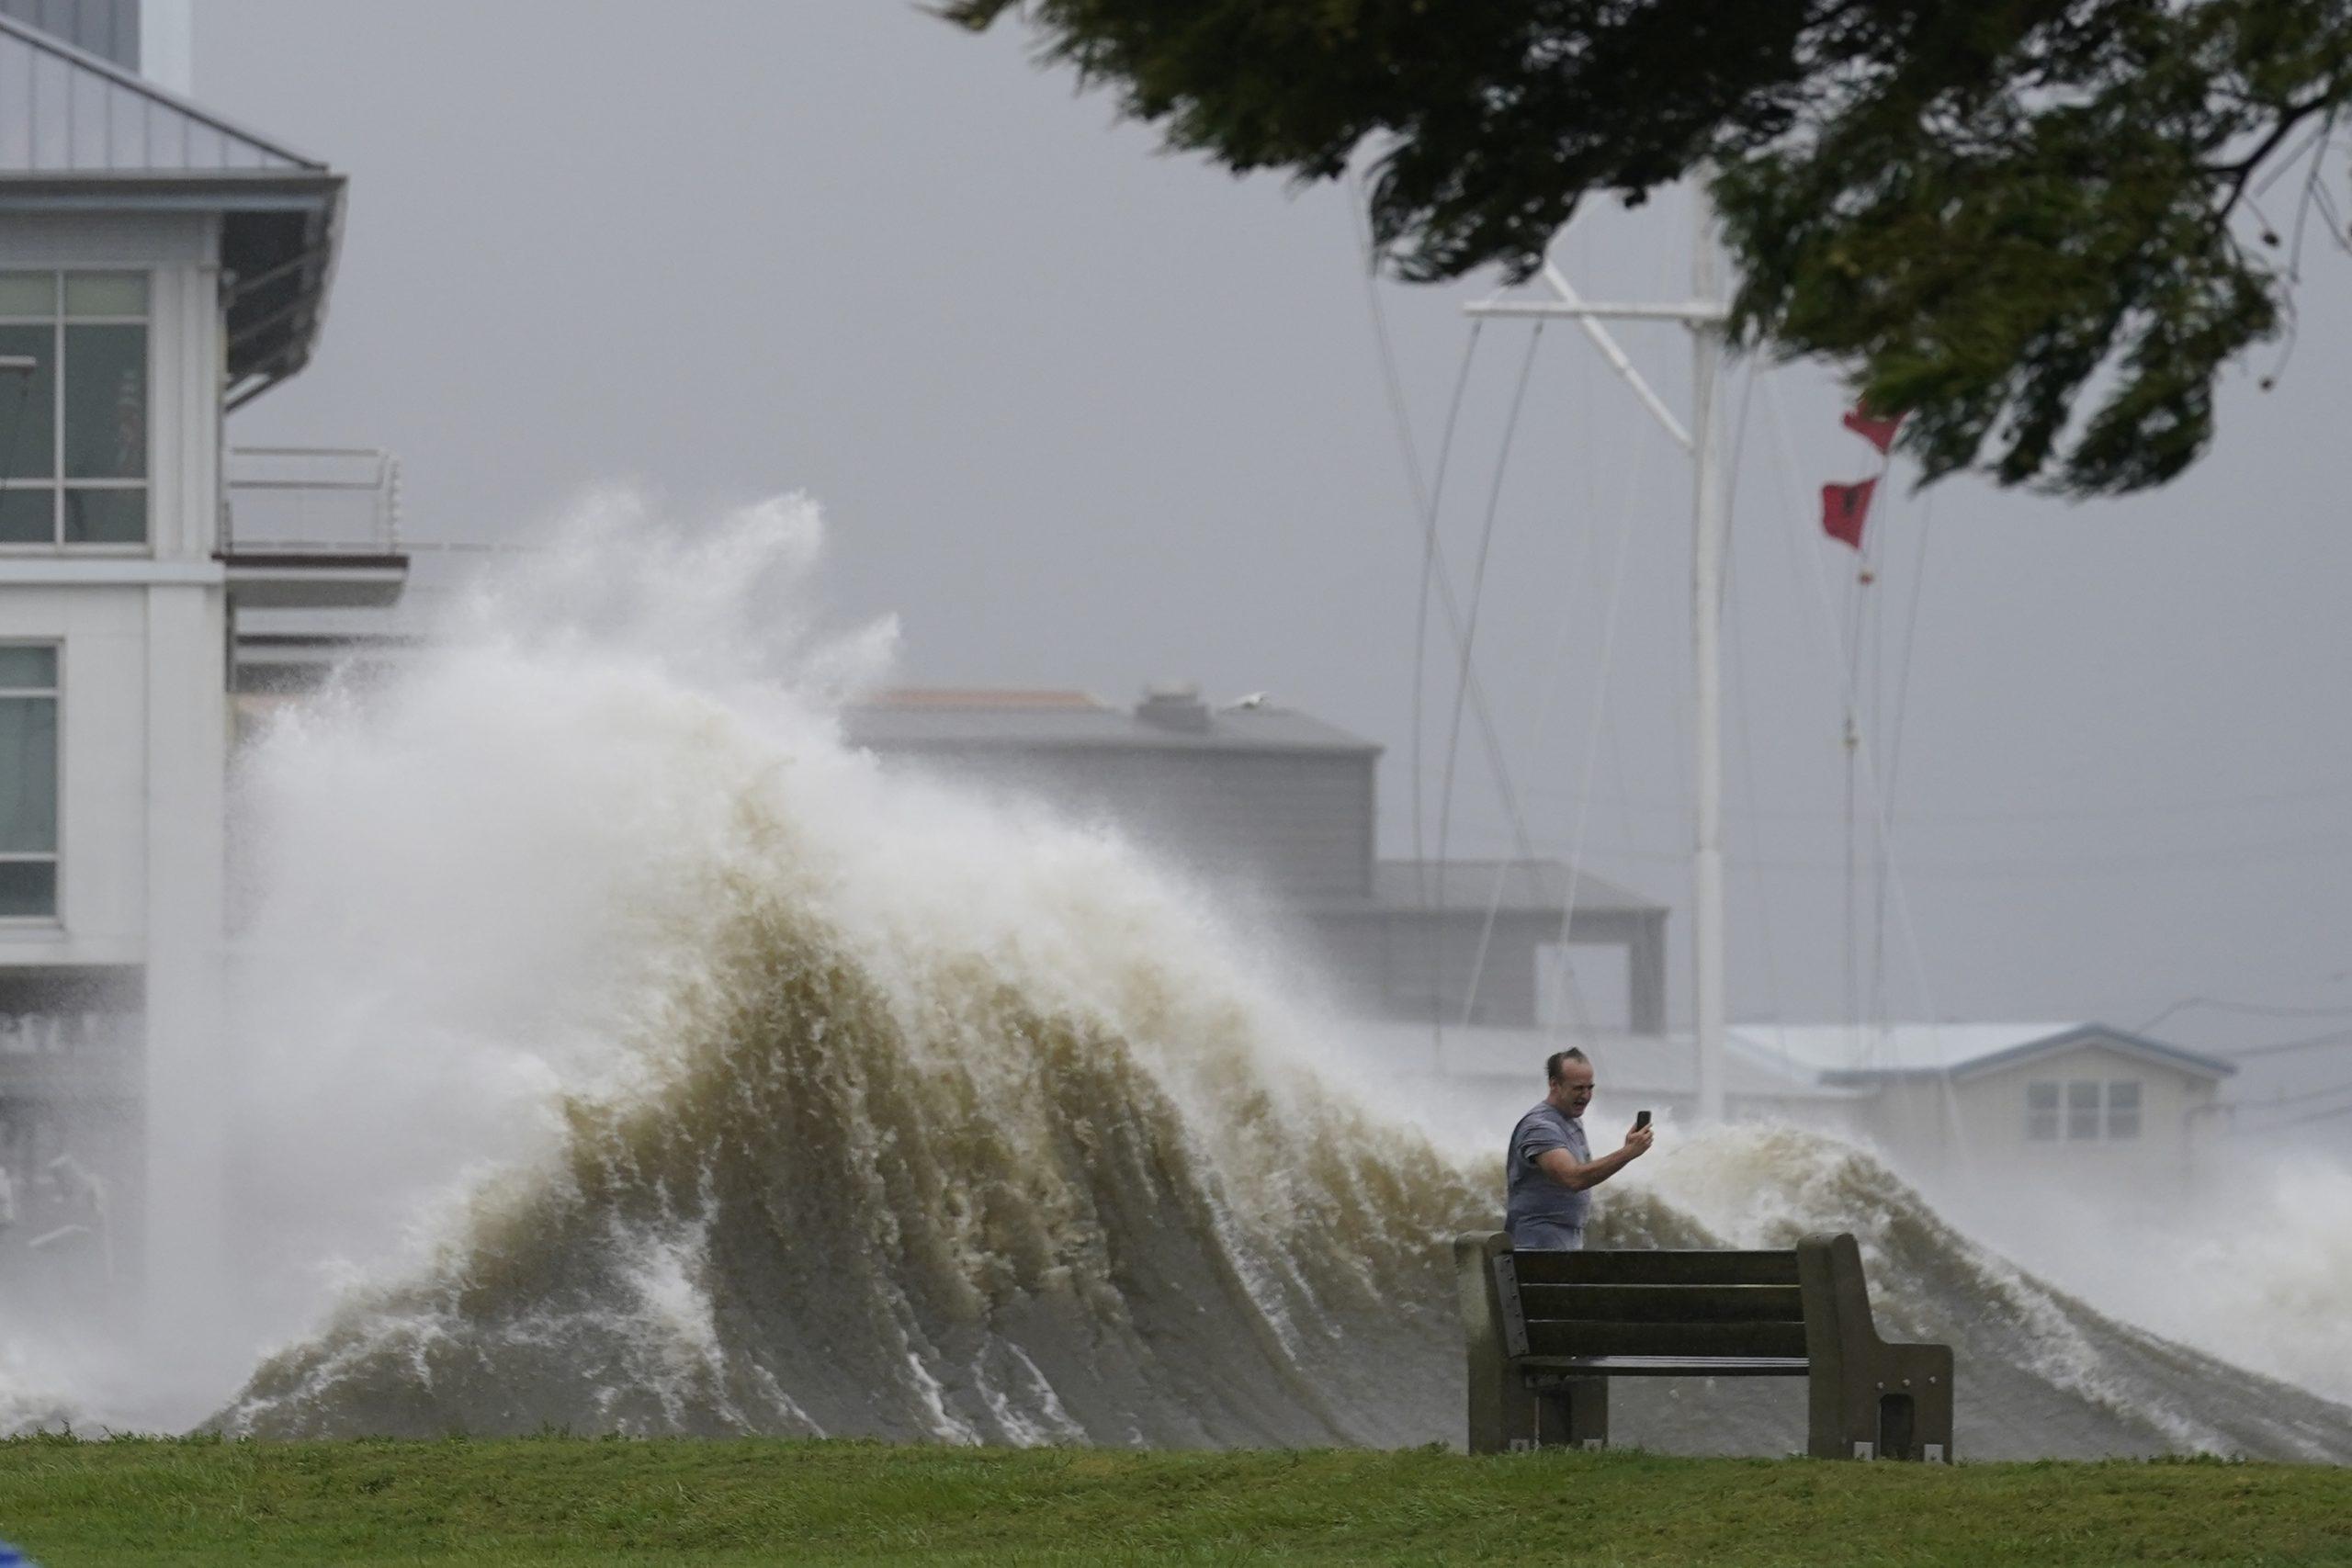 Our embassy in Washington warns citizens of Hurricane Ida